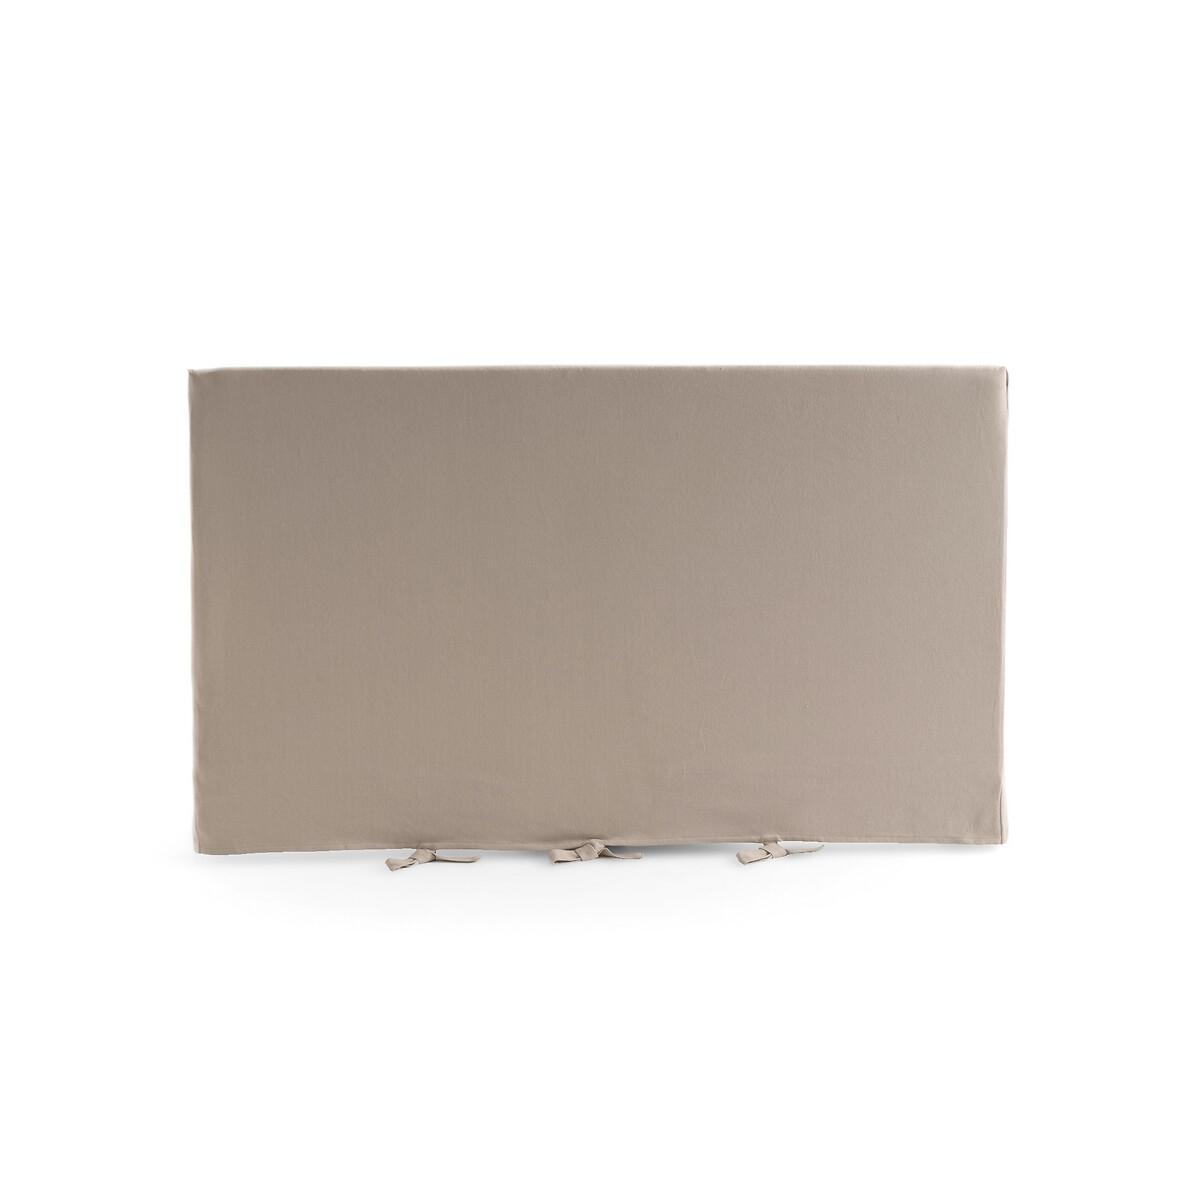 Чехол LaRedoute На изголовье прямой из 100 хлопка Panama 180 x 85 см бежевый